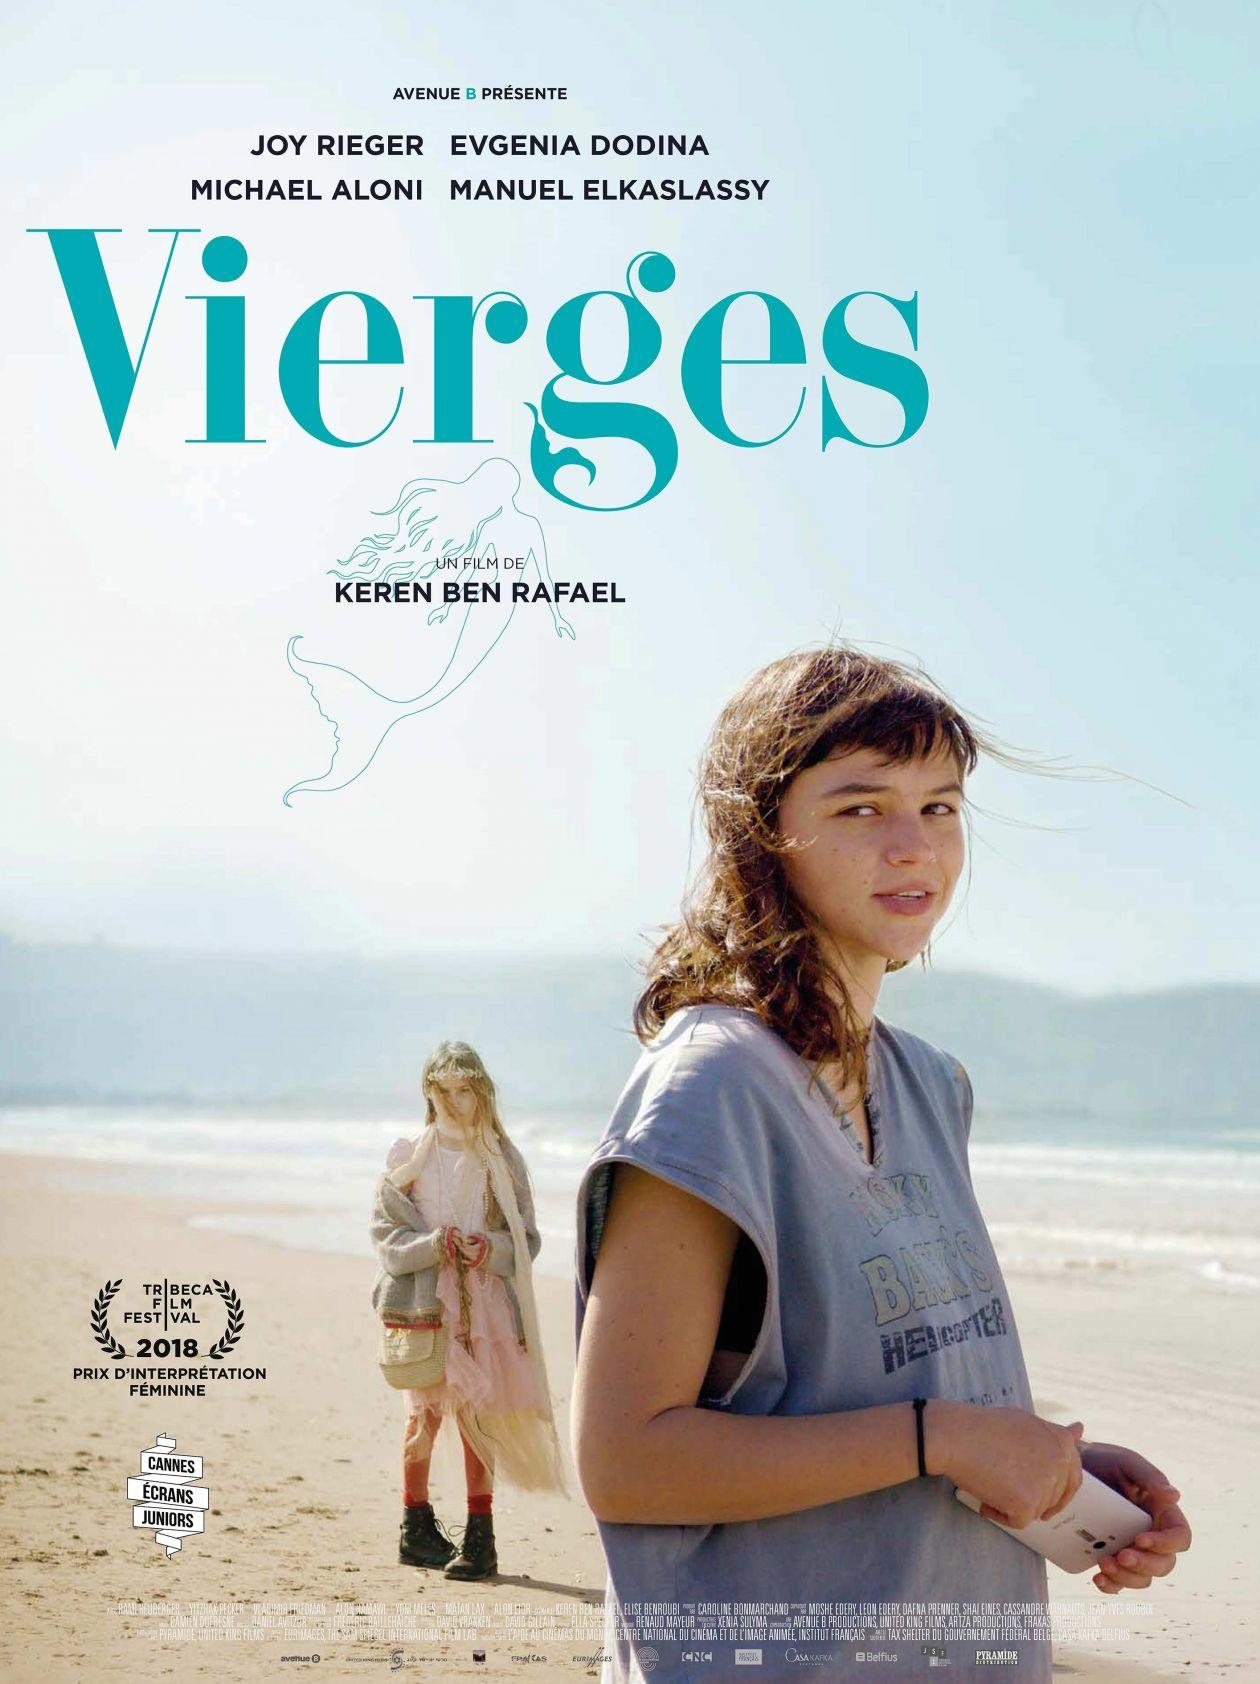 Joy Rieger / Lana   Vierges / Virgins / אין בתולות בקריות   Keren Ben Rafael